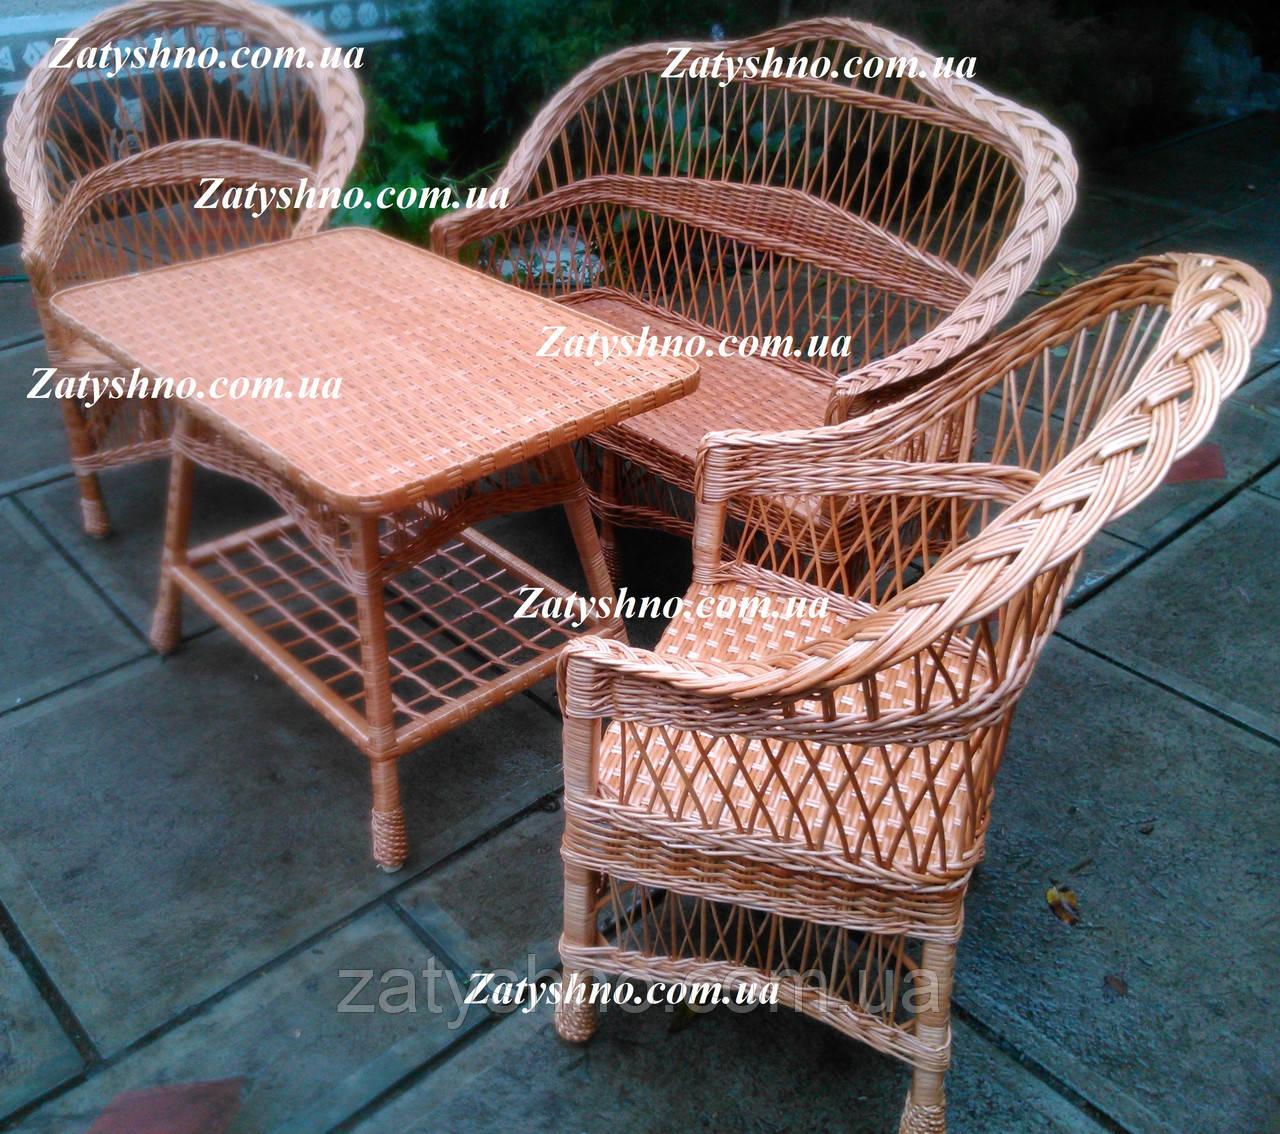 Комплект мебели из лозы